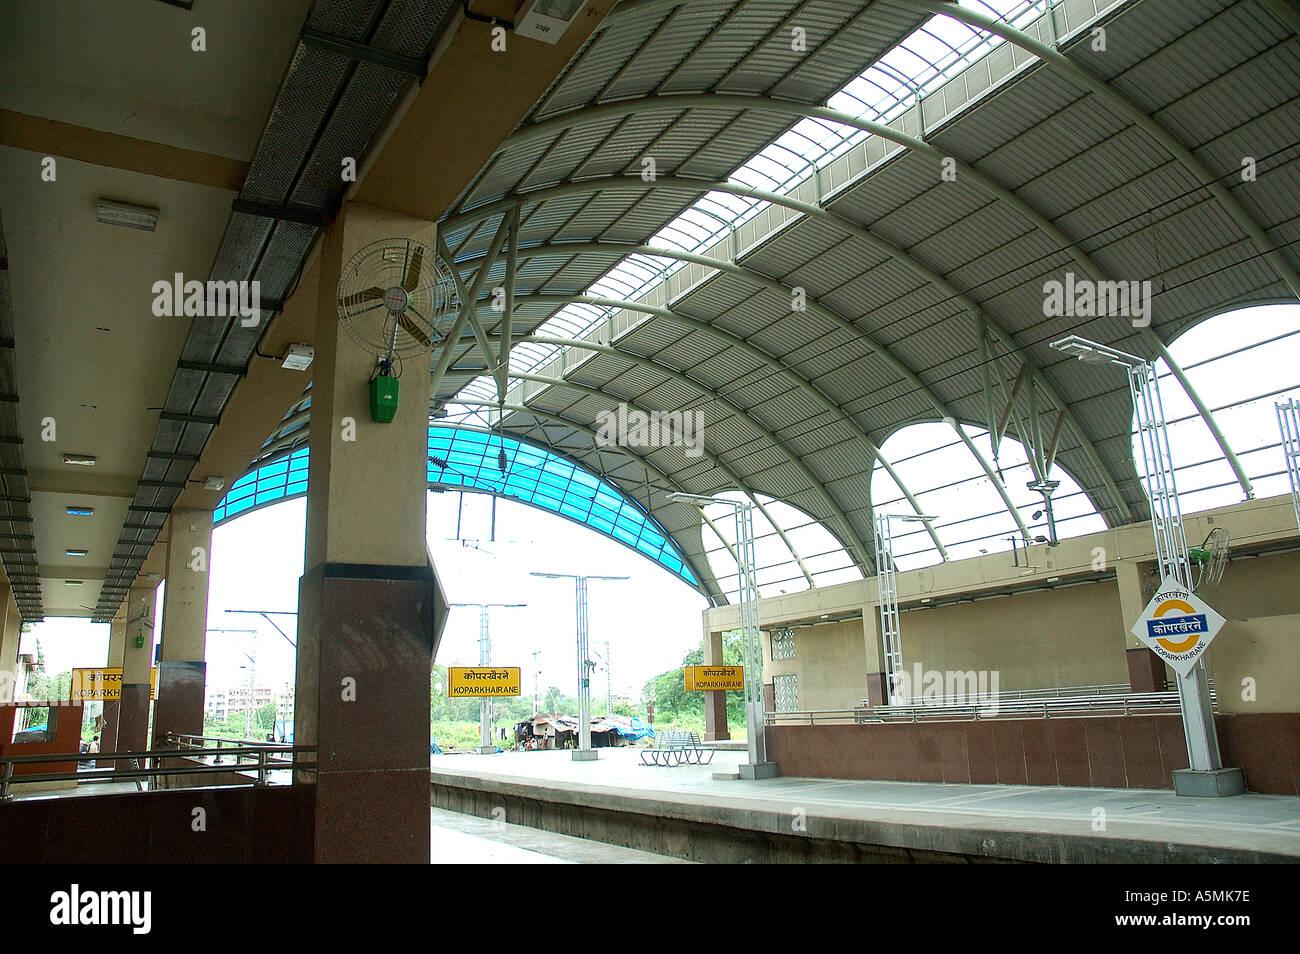 RAJ98892 moderne neue Koper Khairne Railway Station Navi Mumbai Vashi Bombay Maharashtra, Indien Stockbild